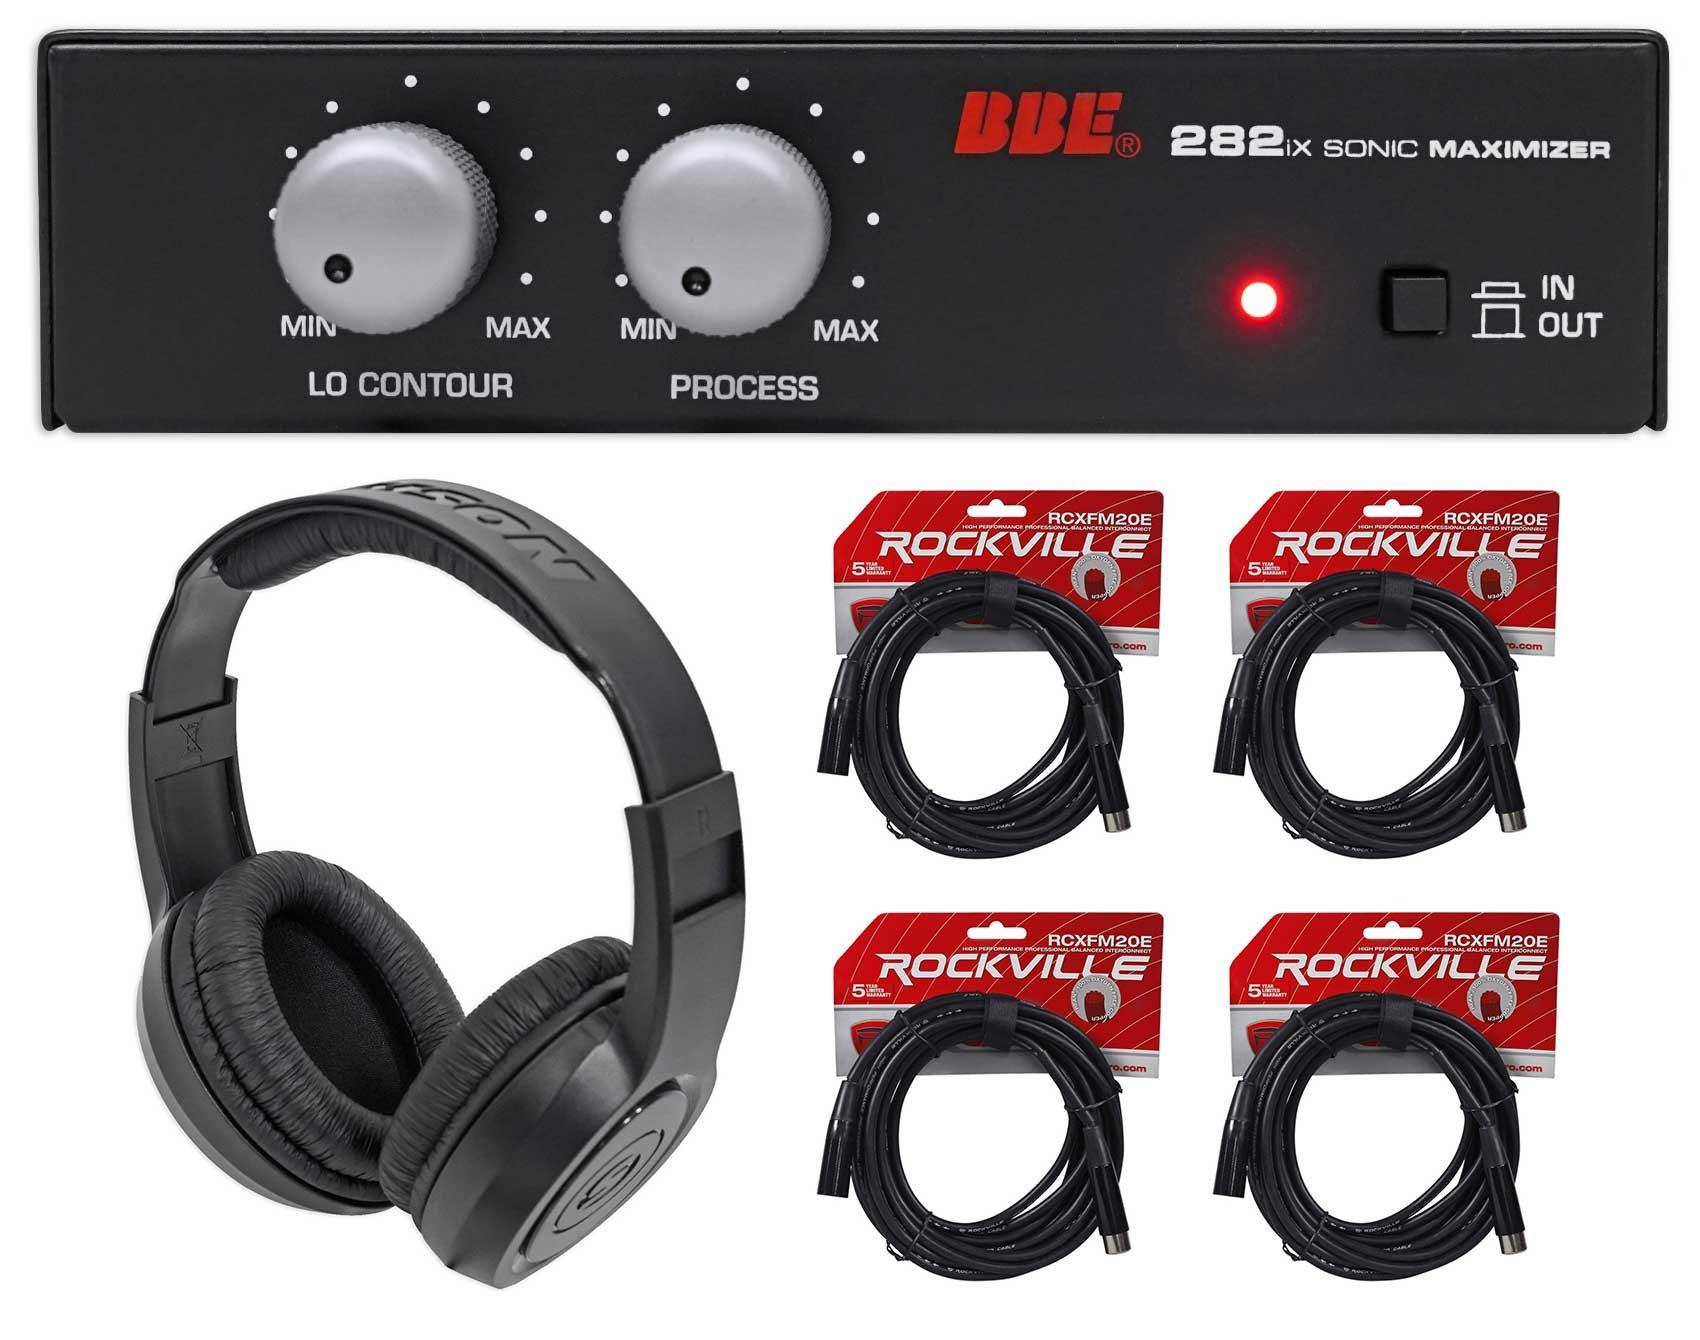 BBE 282IX Desktop Sonic Maximizer w/XLR Inputs/Outputs+Headphones+(4) XLR Cables